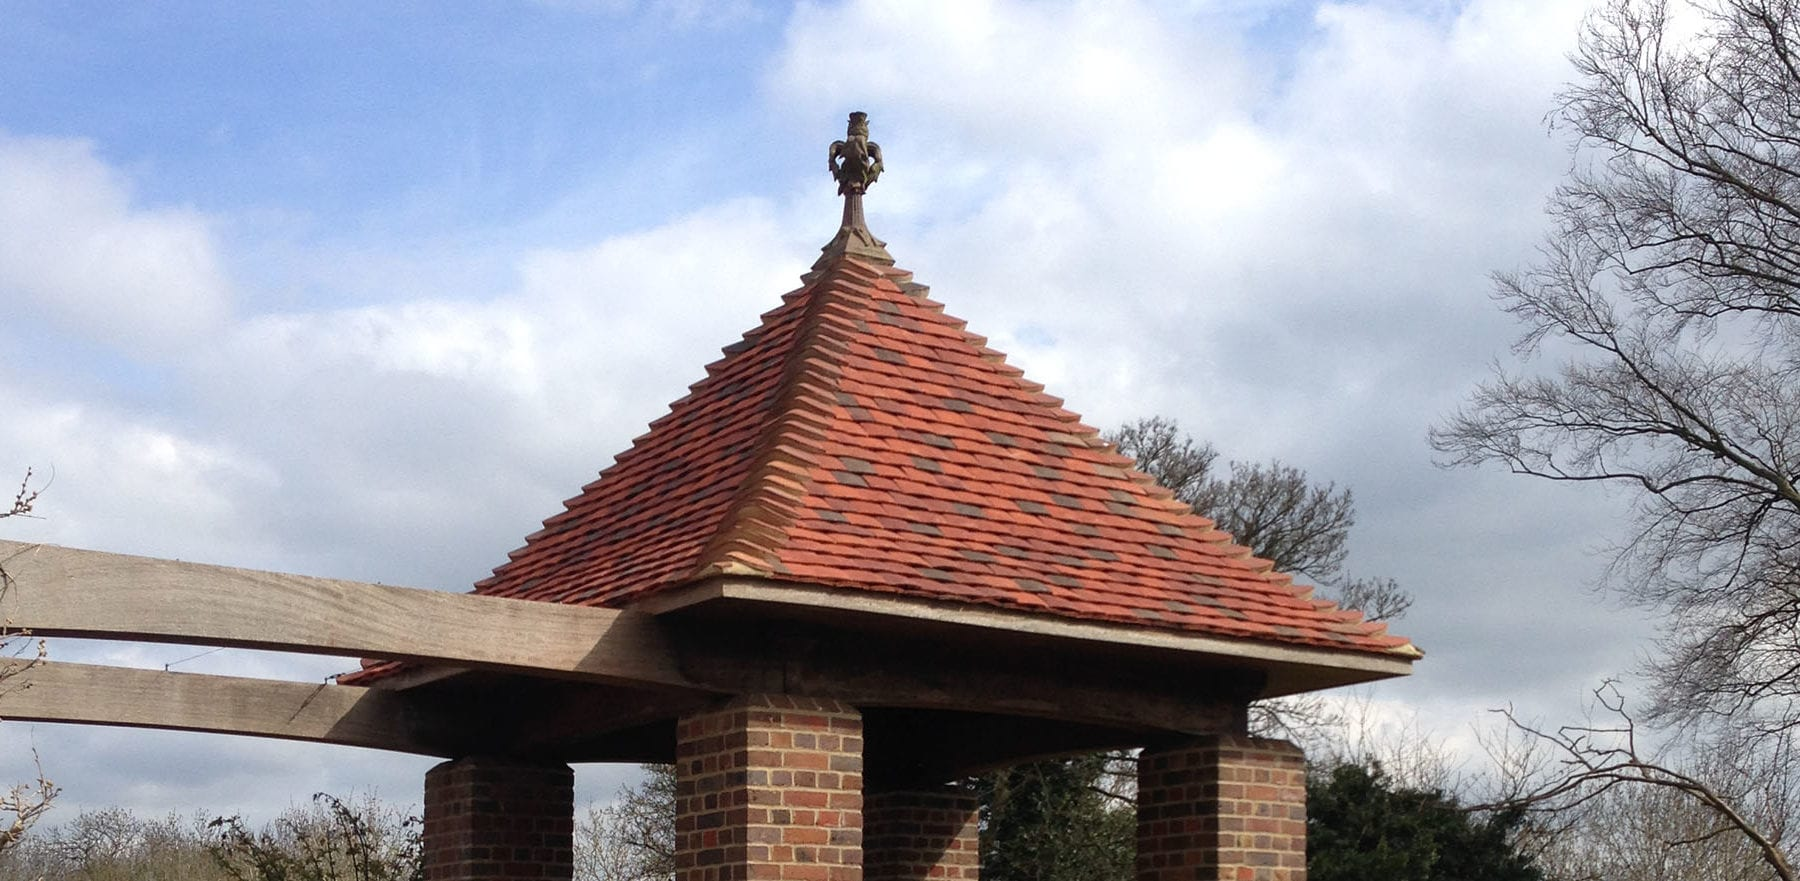 Lifestiles - Handmade Bespoke Clay Roof Tiles - Chipstead, England 5